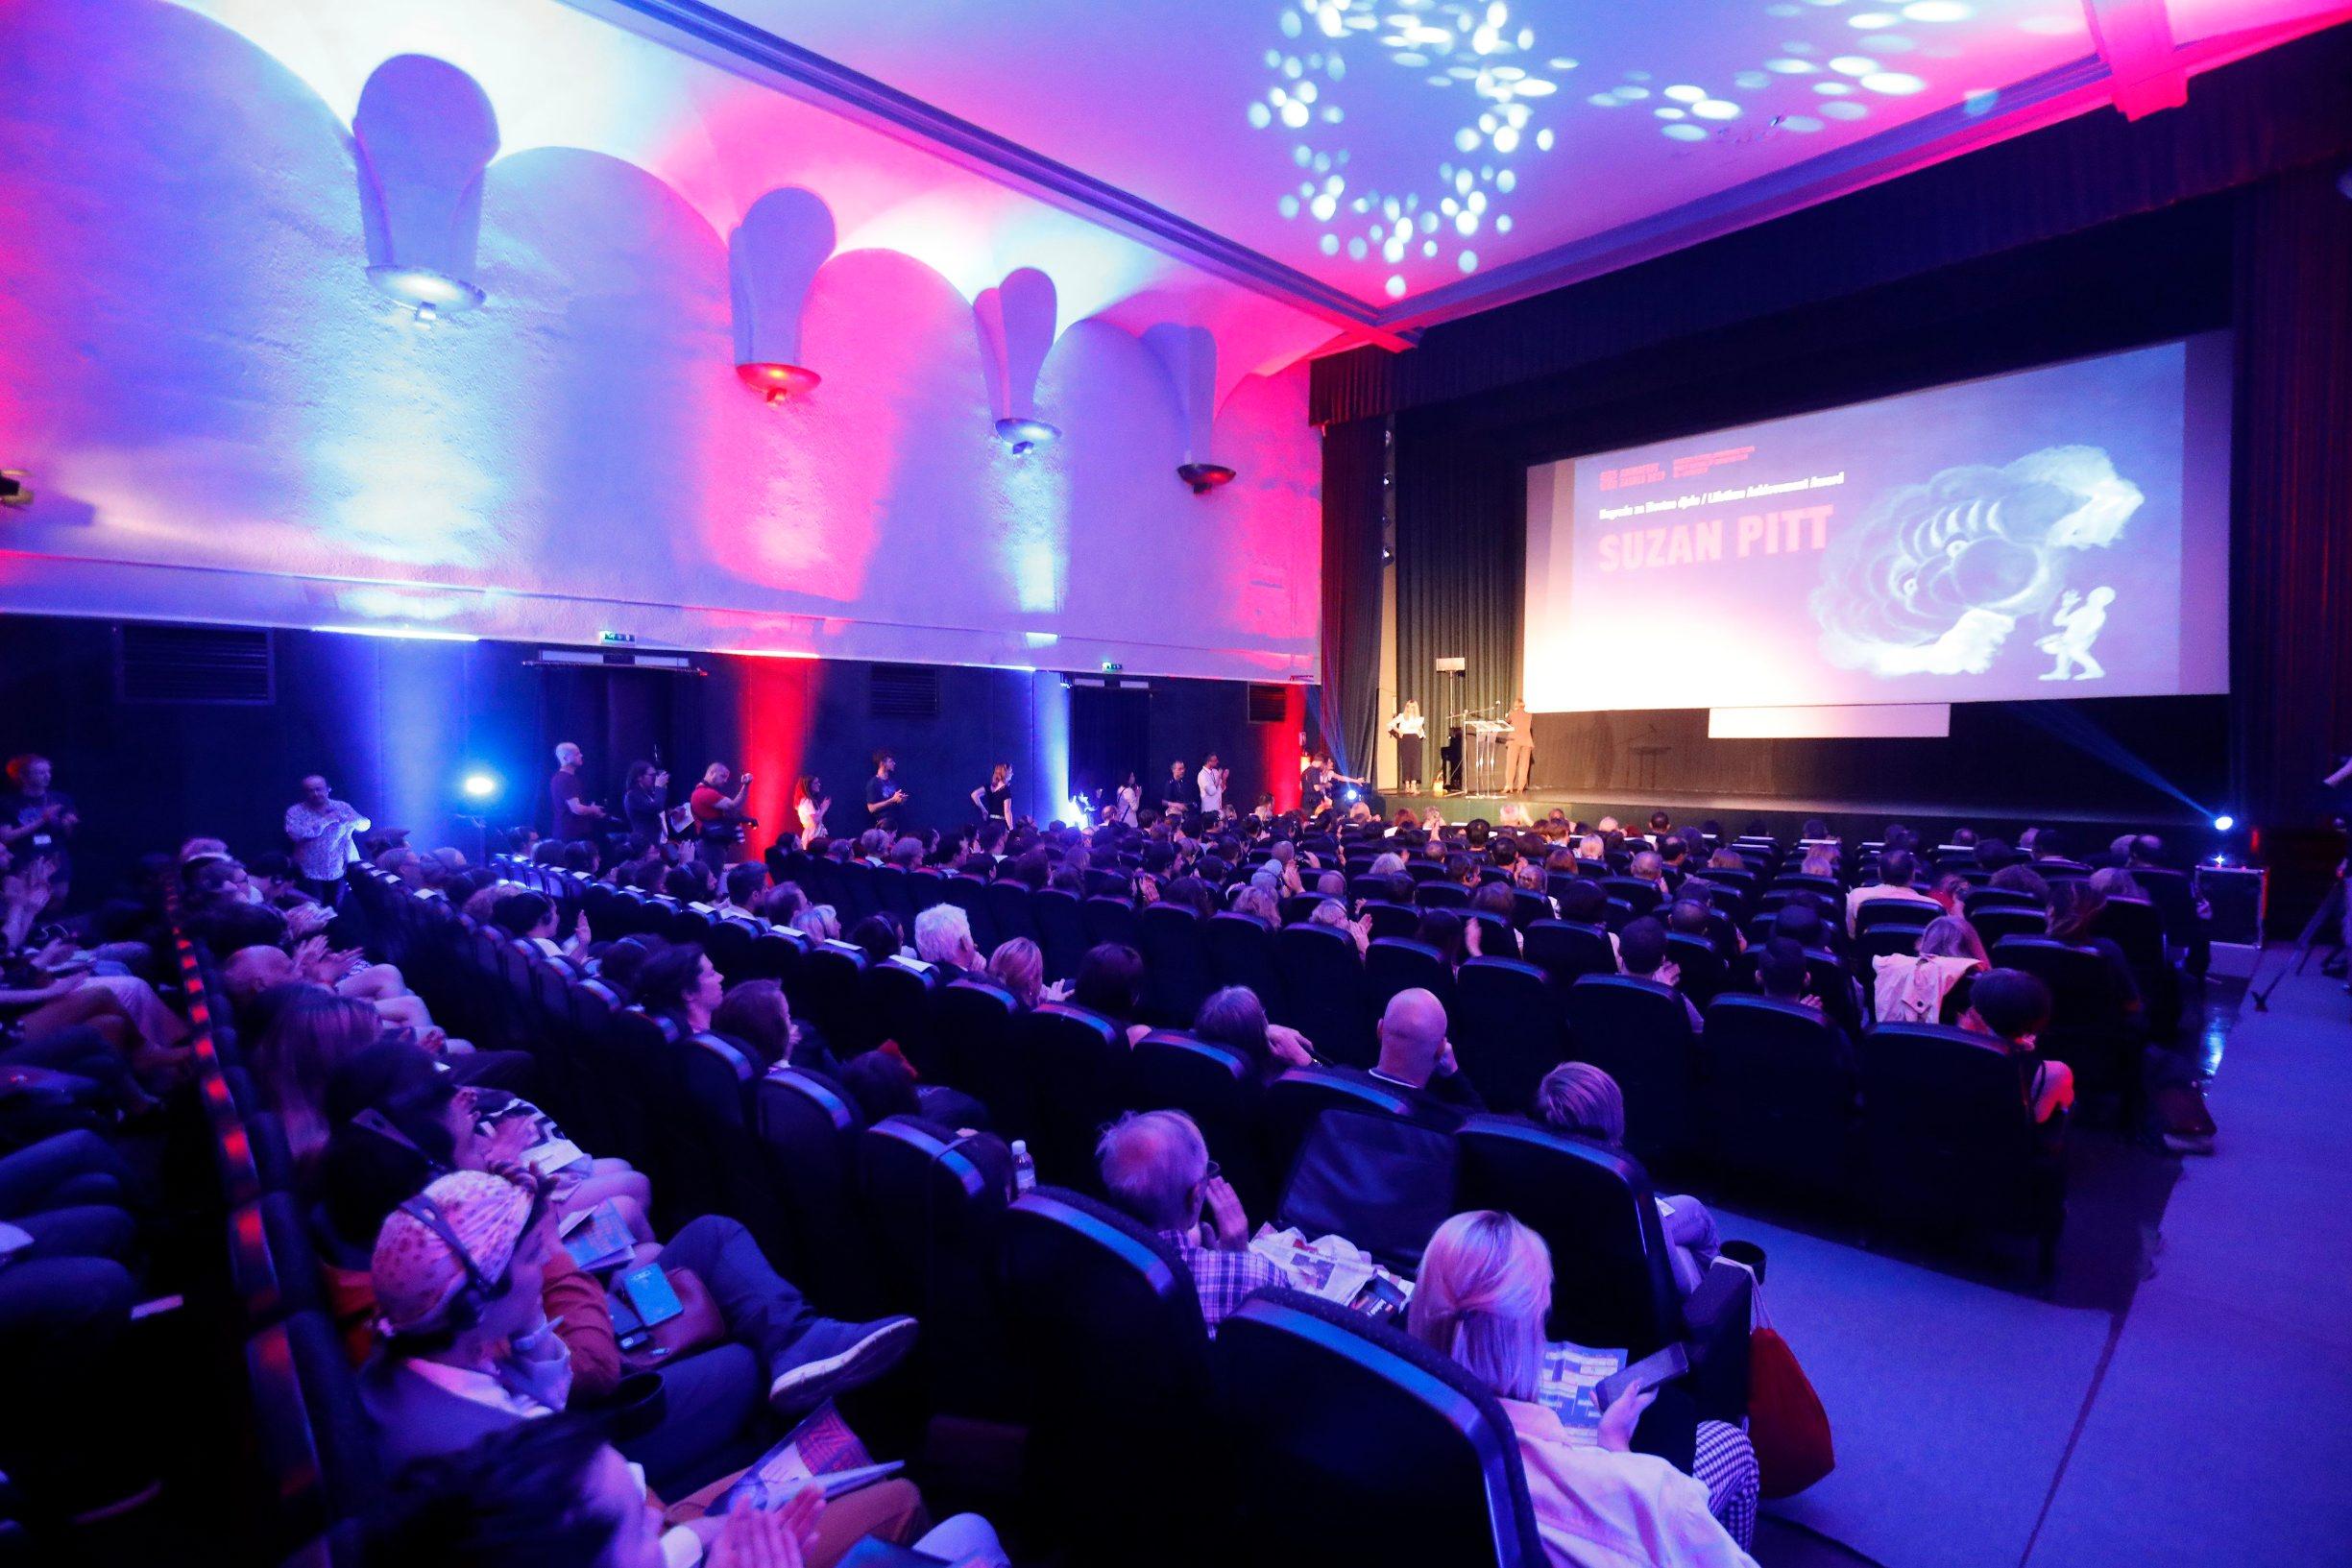 Zagreb, 030619. U kinu Tuskanac otvoren festival animiranog filma Animafest 2019. Na fotografiji: otvorenje Animafesta 2019. Foto: Tomislav Kristo / CROPIX